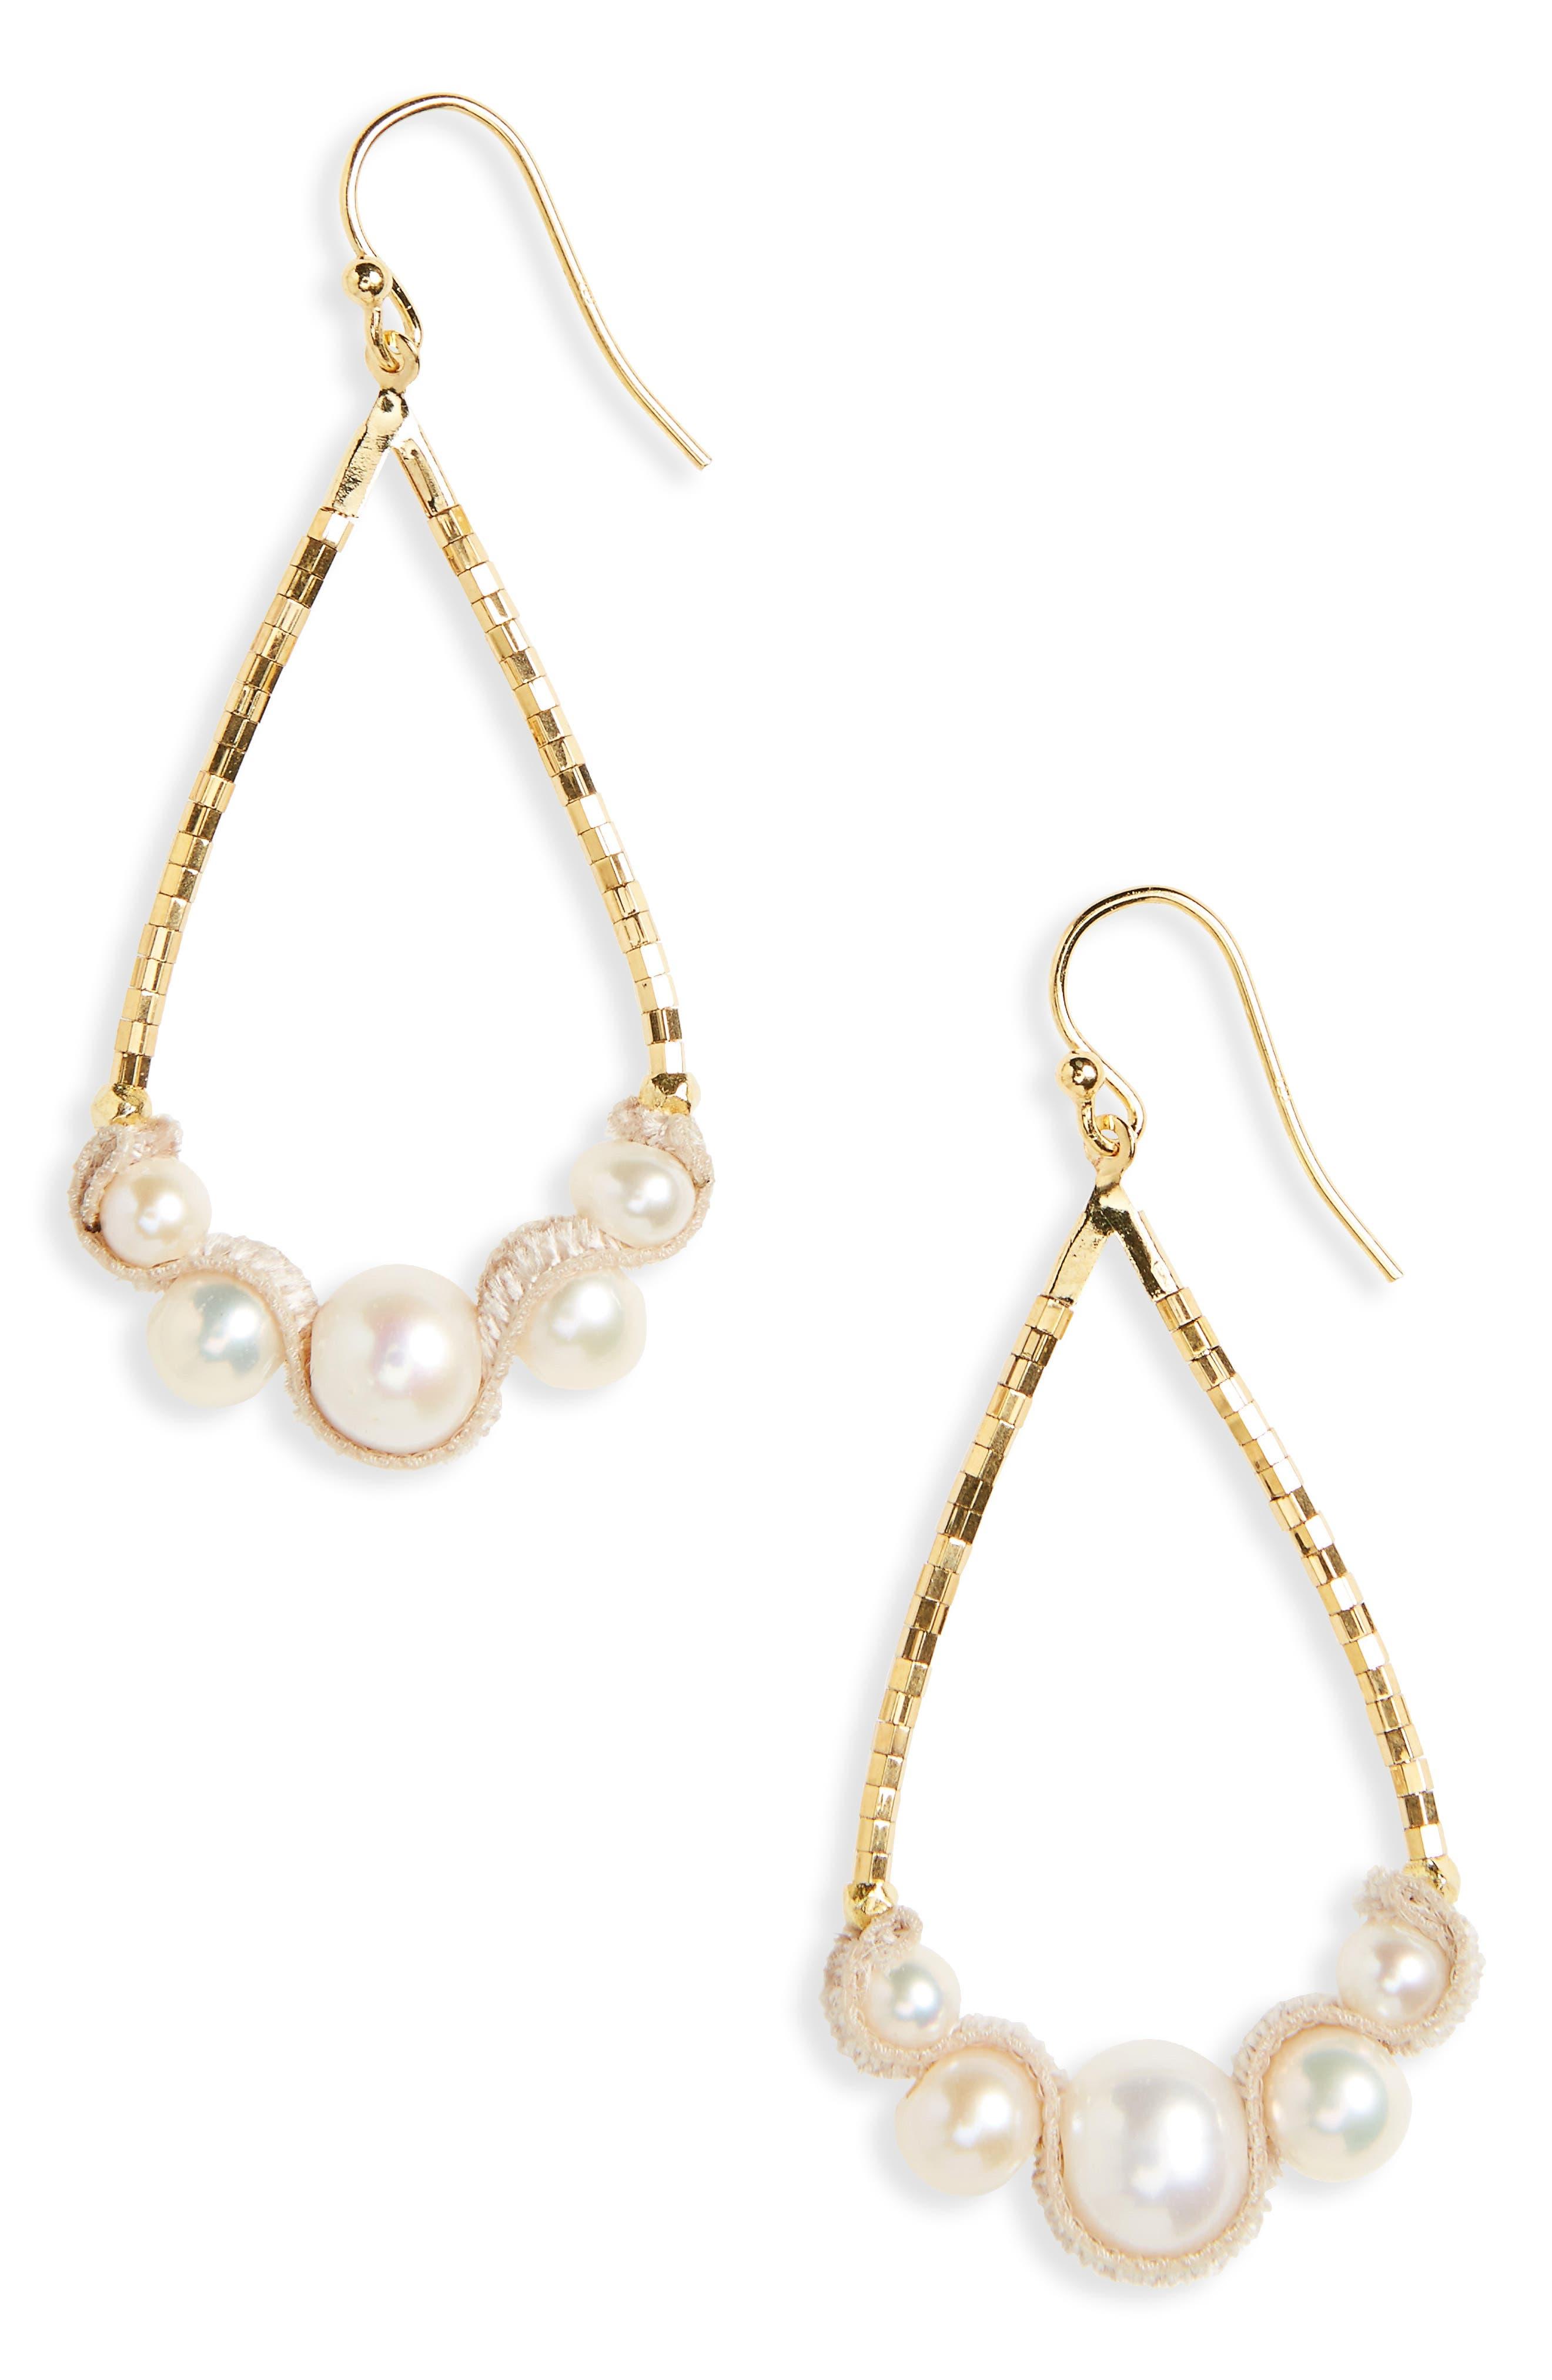 Pearl & Velvet Drop Earrings,                         Main,                         color, White Pearl